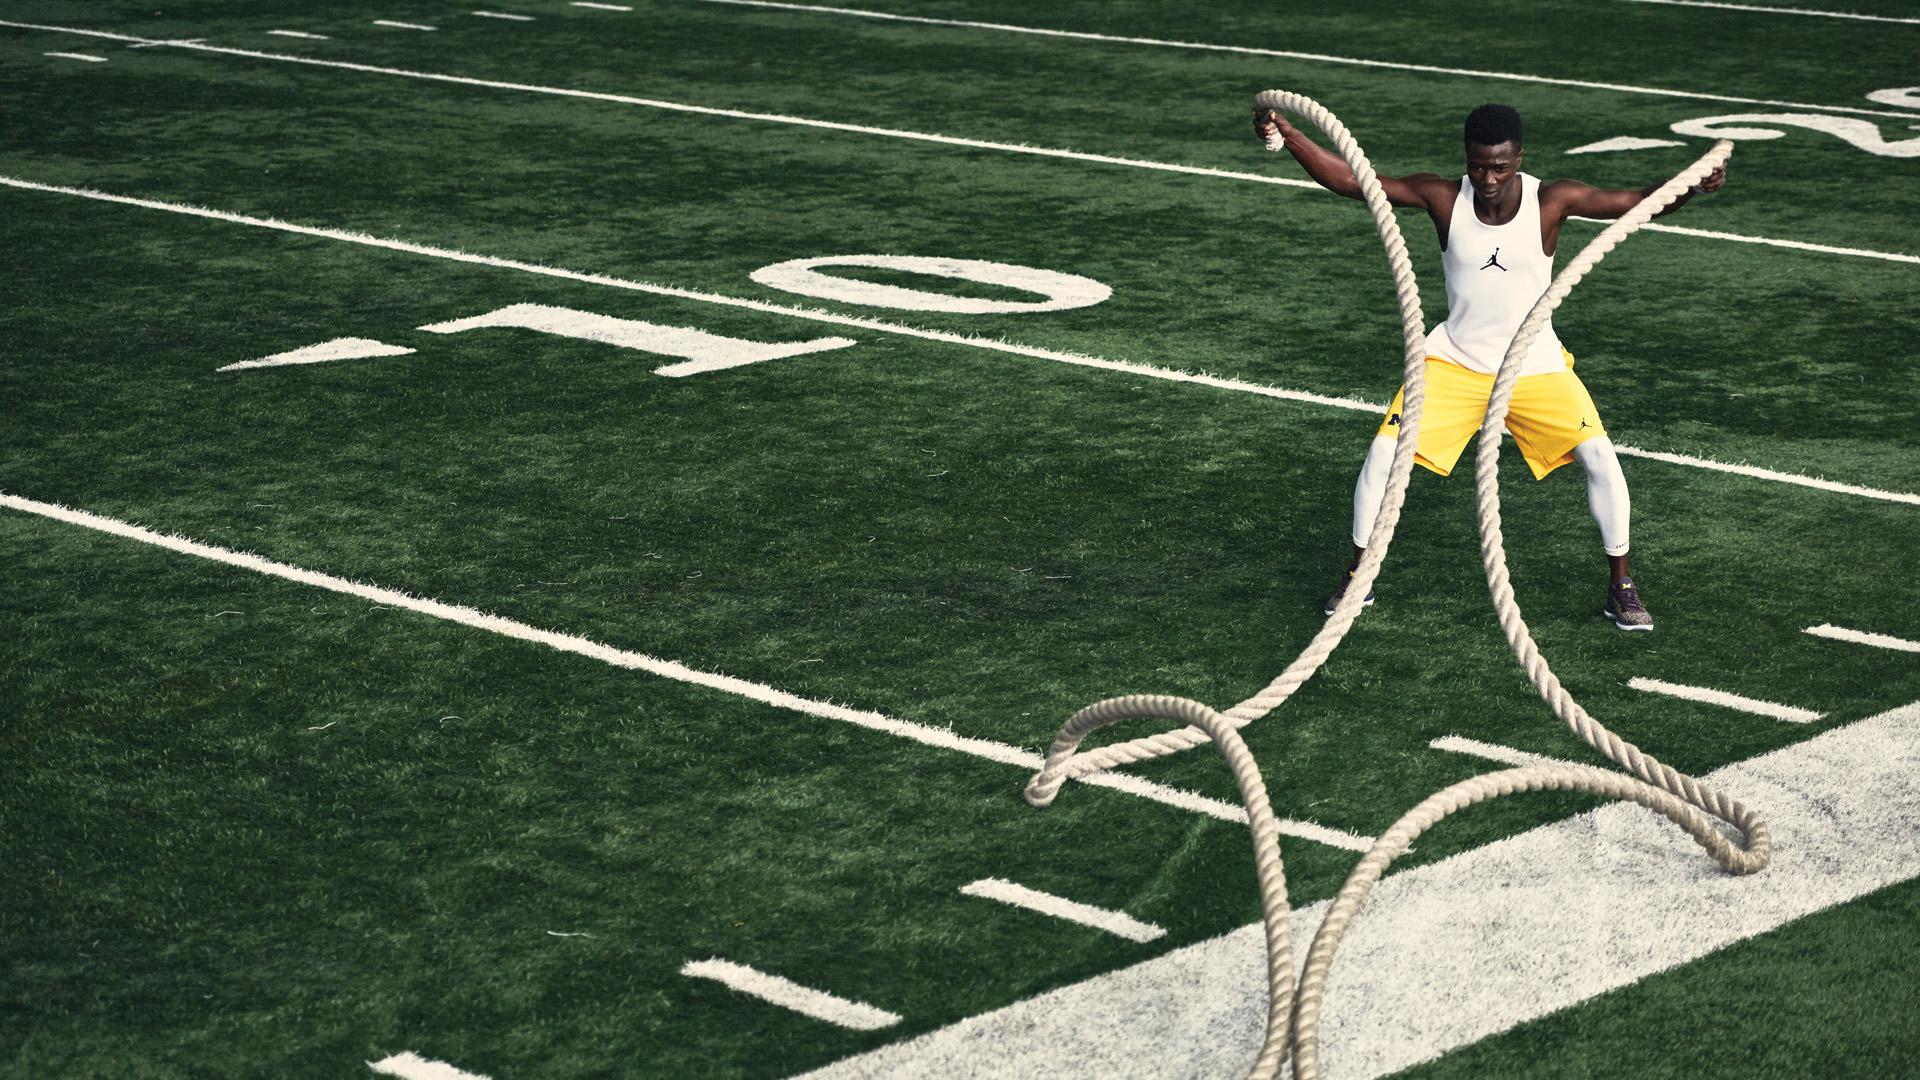 Nike_photoshoot_JDN_Michigan_04.jpg